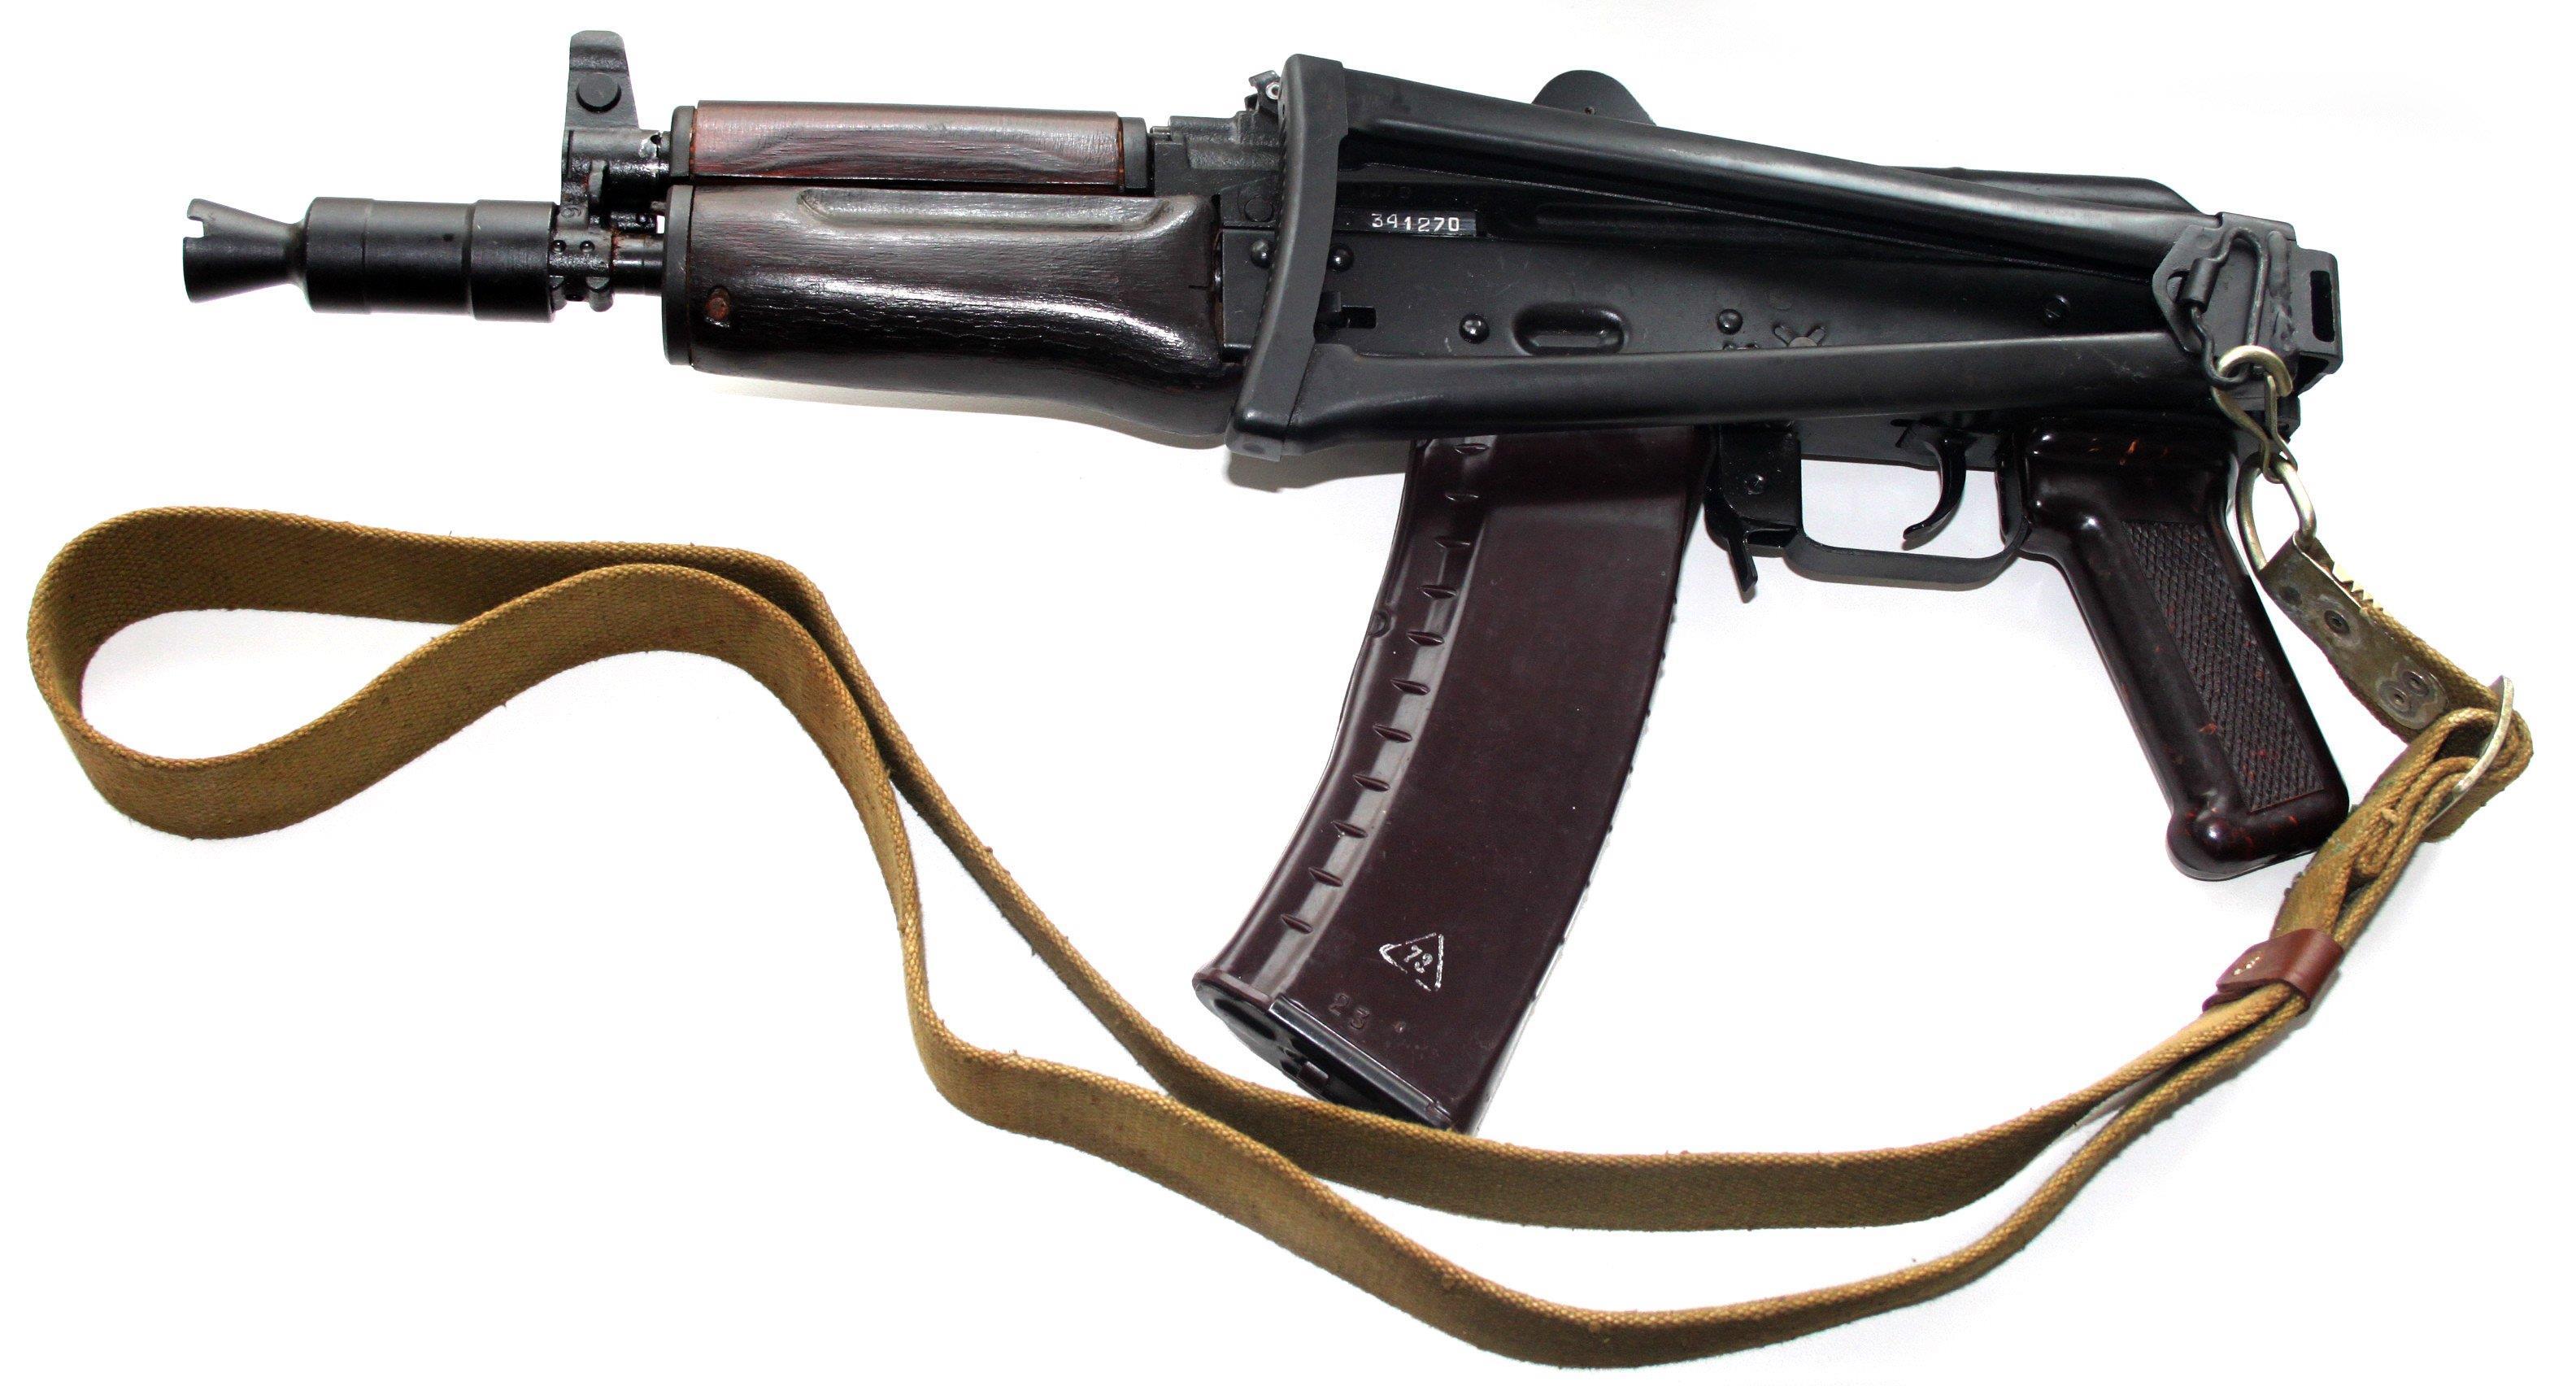 АКС-74У со сложенным прикладом